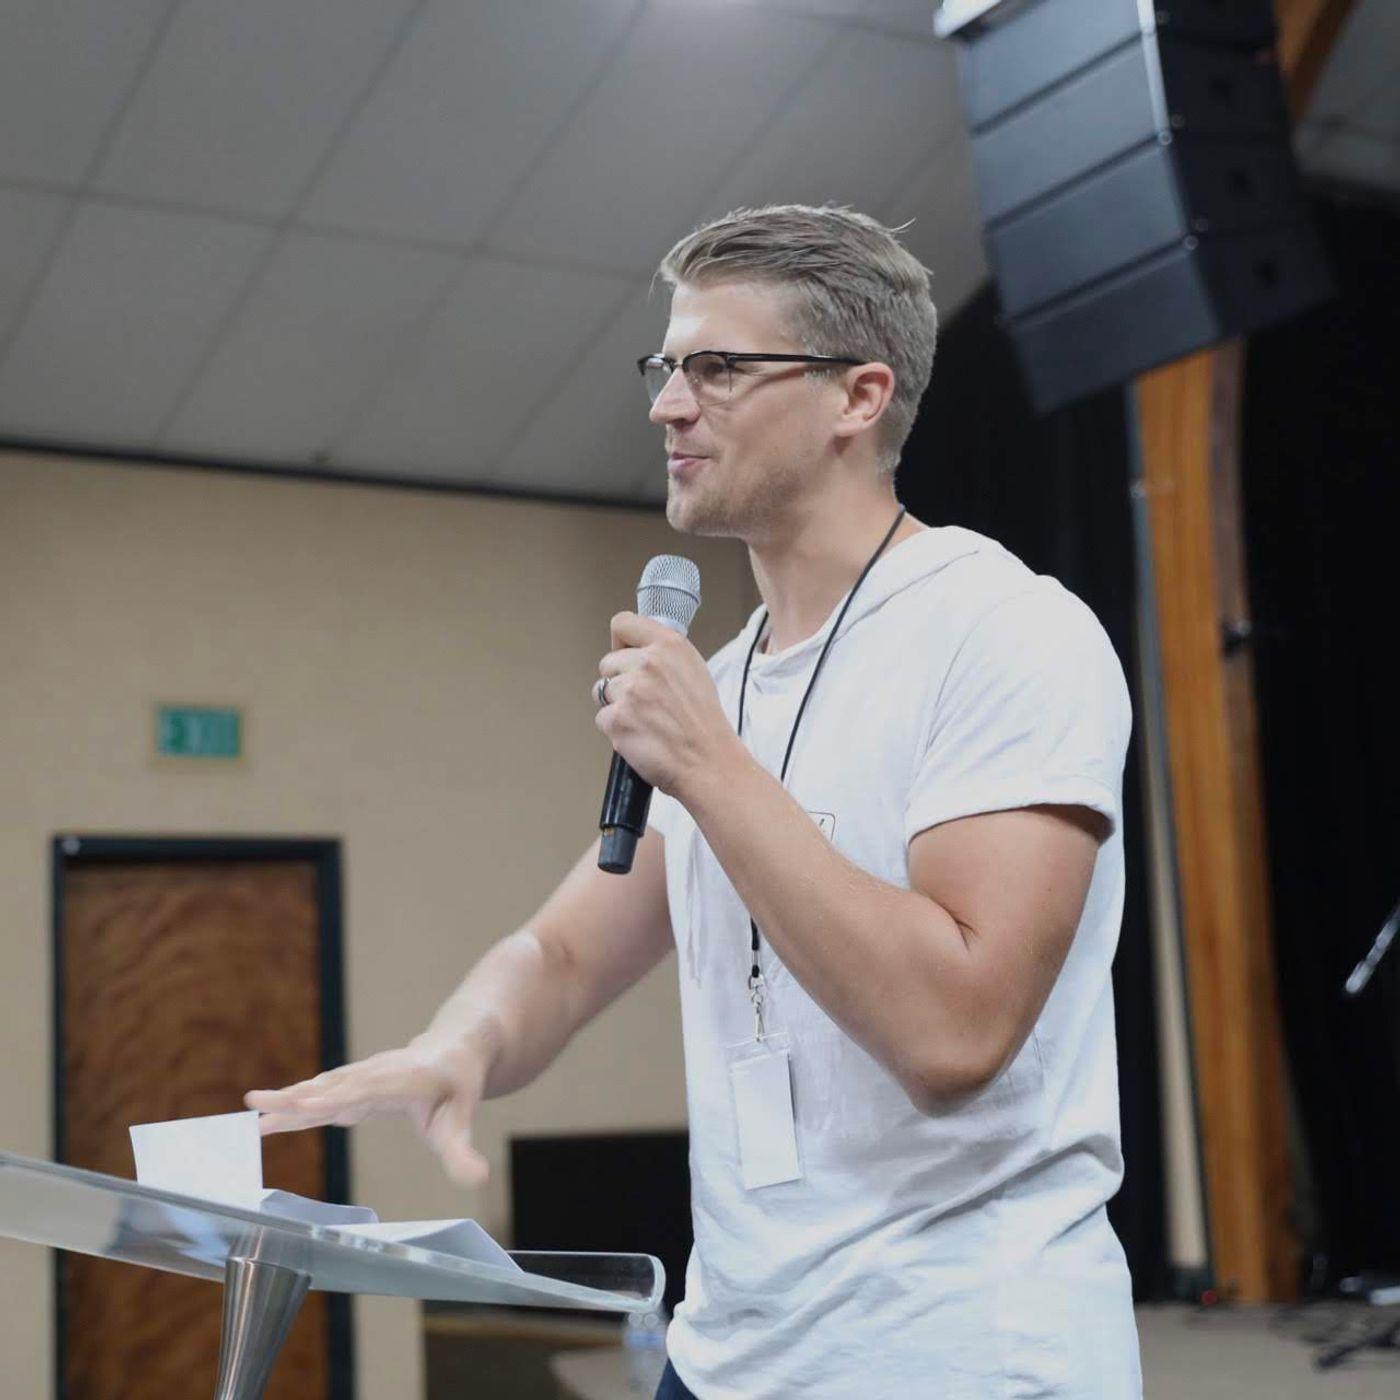 Nourishing Your Life Group - Rikhard Hartikainen